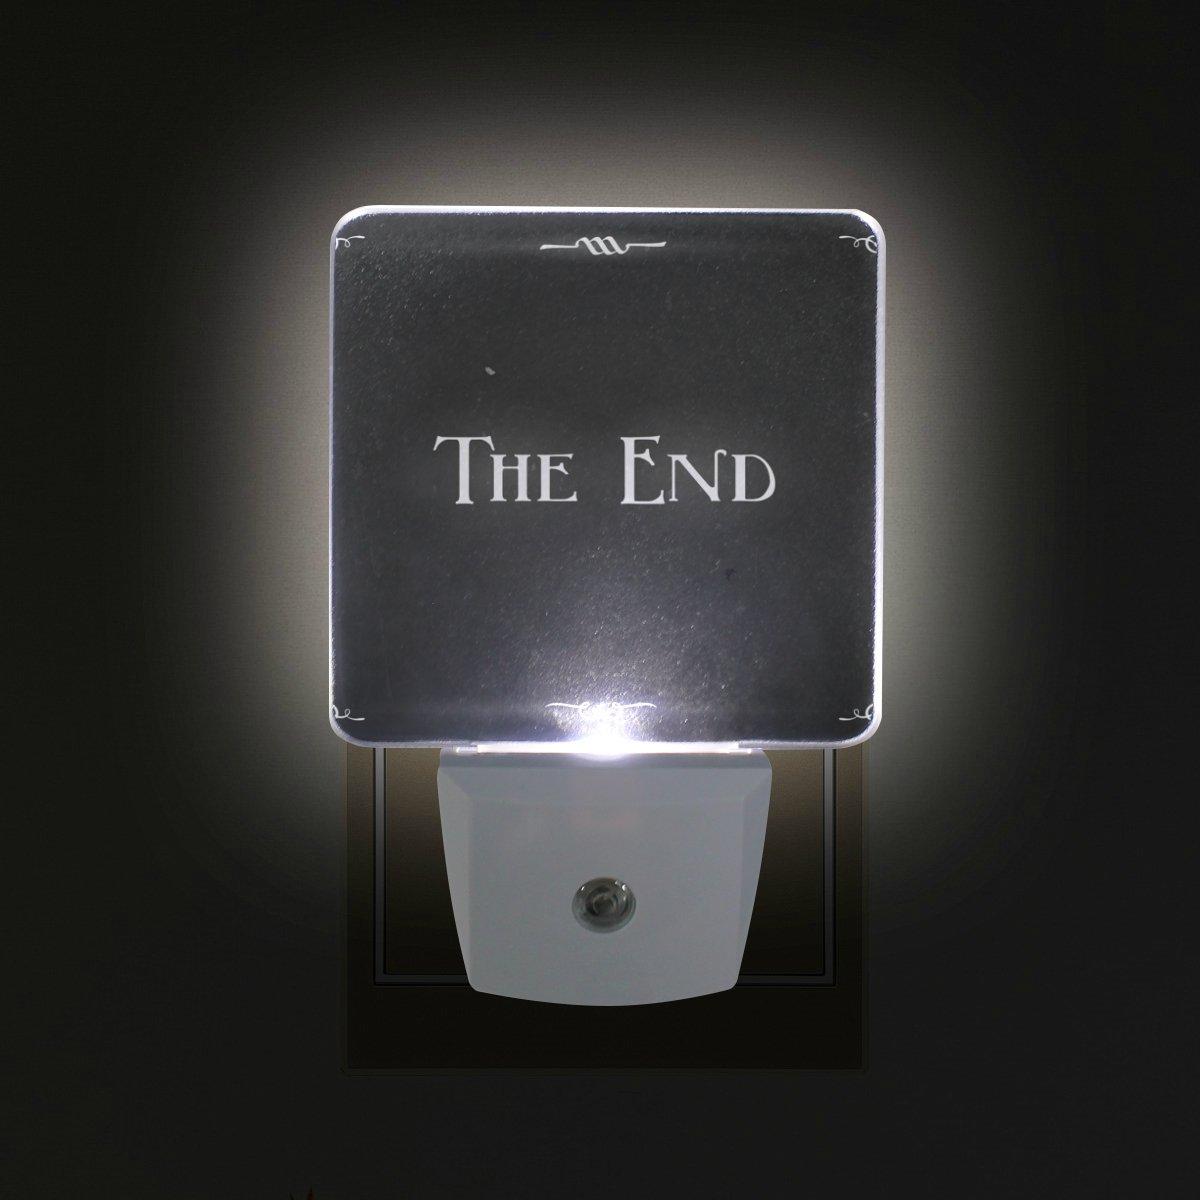 ALIREA Movie Ending Screen Plug in LED Night Light Auto Sensor Smart Dusk to Dawn Decorative Night for Bedroom, Bathroom, Kitchen, Hallway, Stairs,Hallway,Baby's Room, Energy Saving